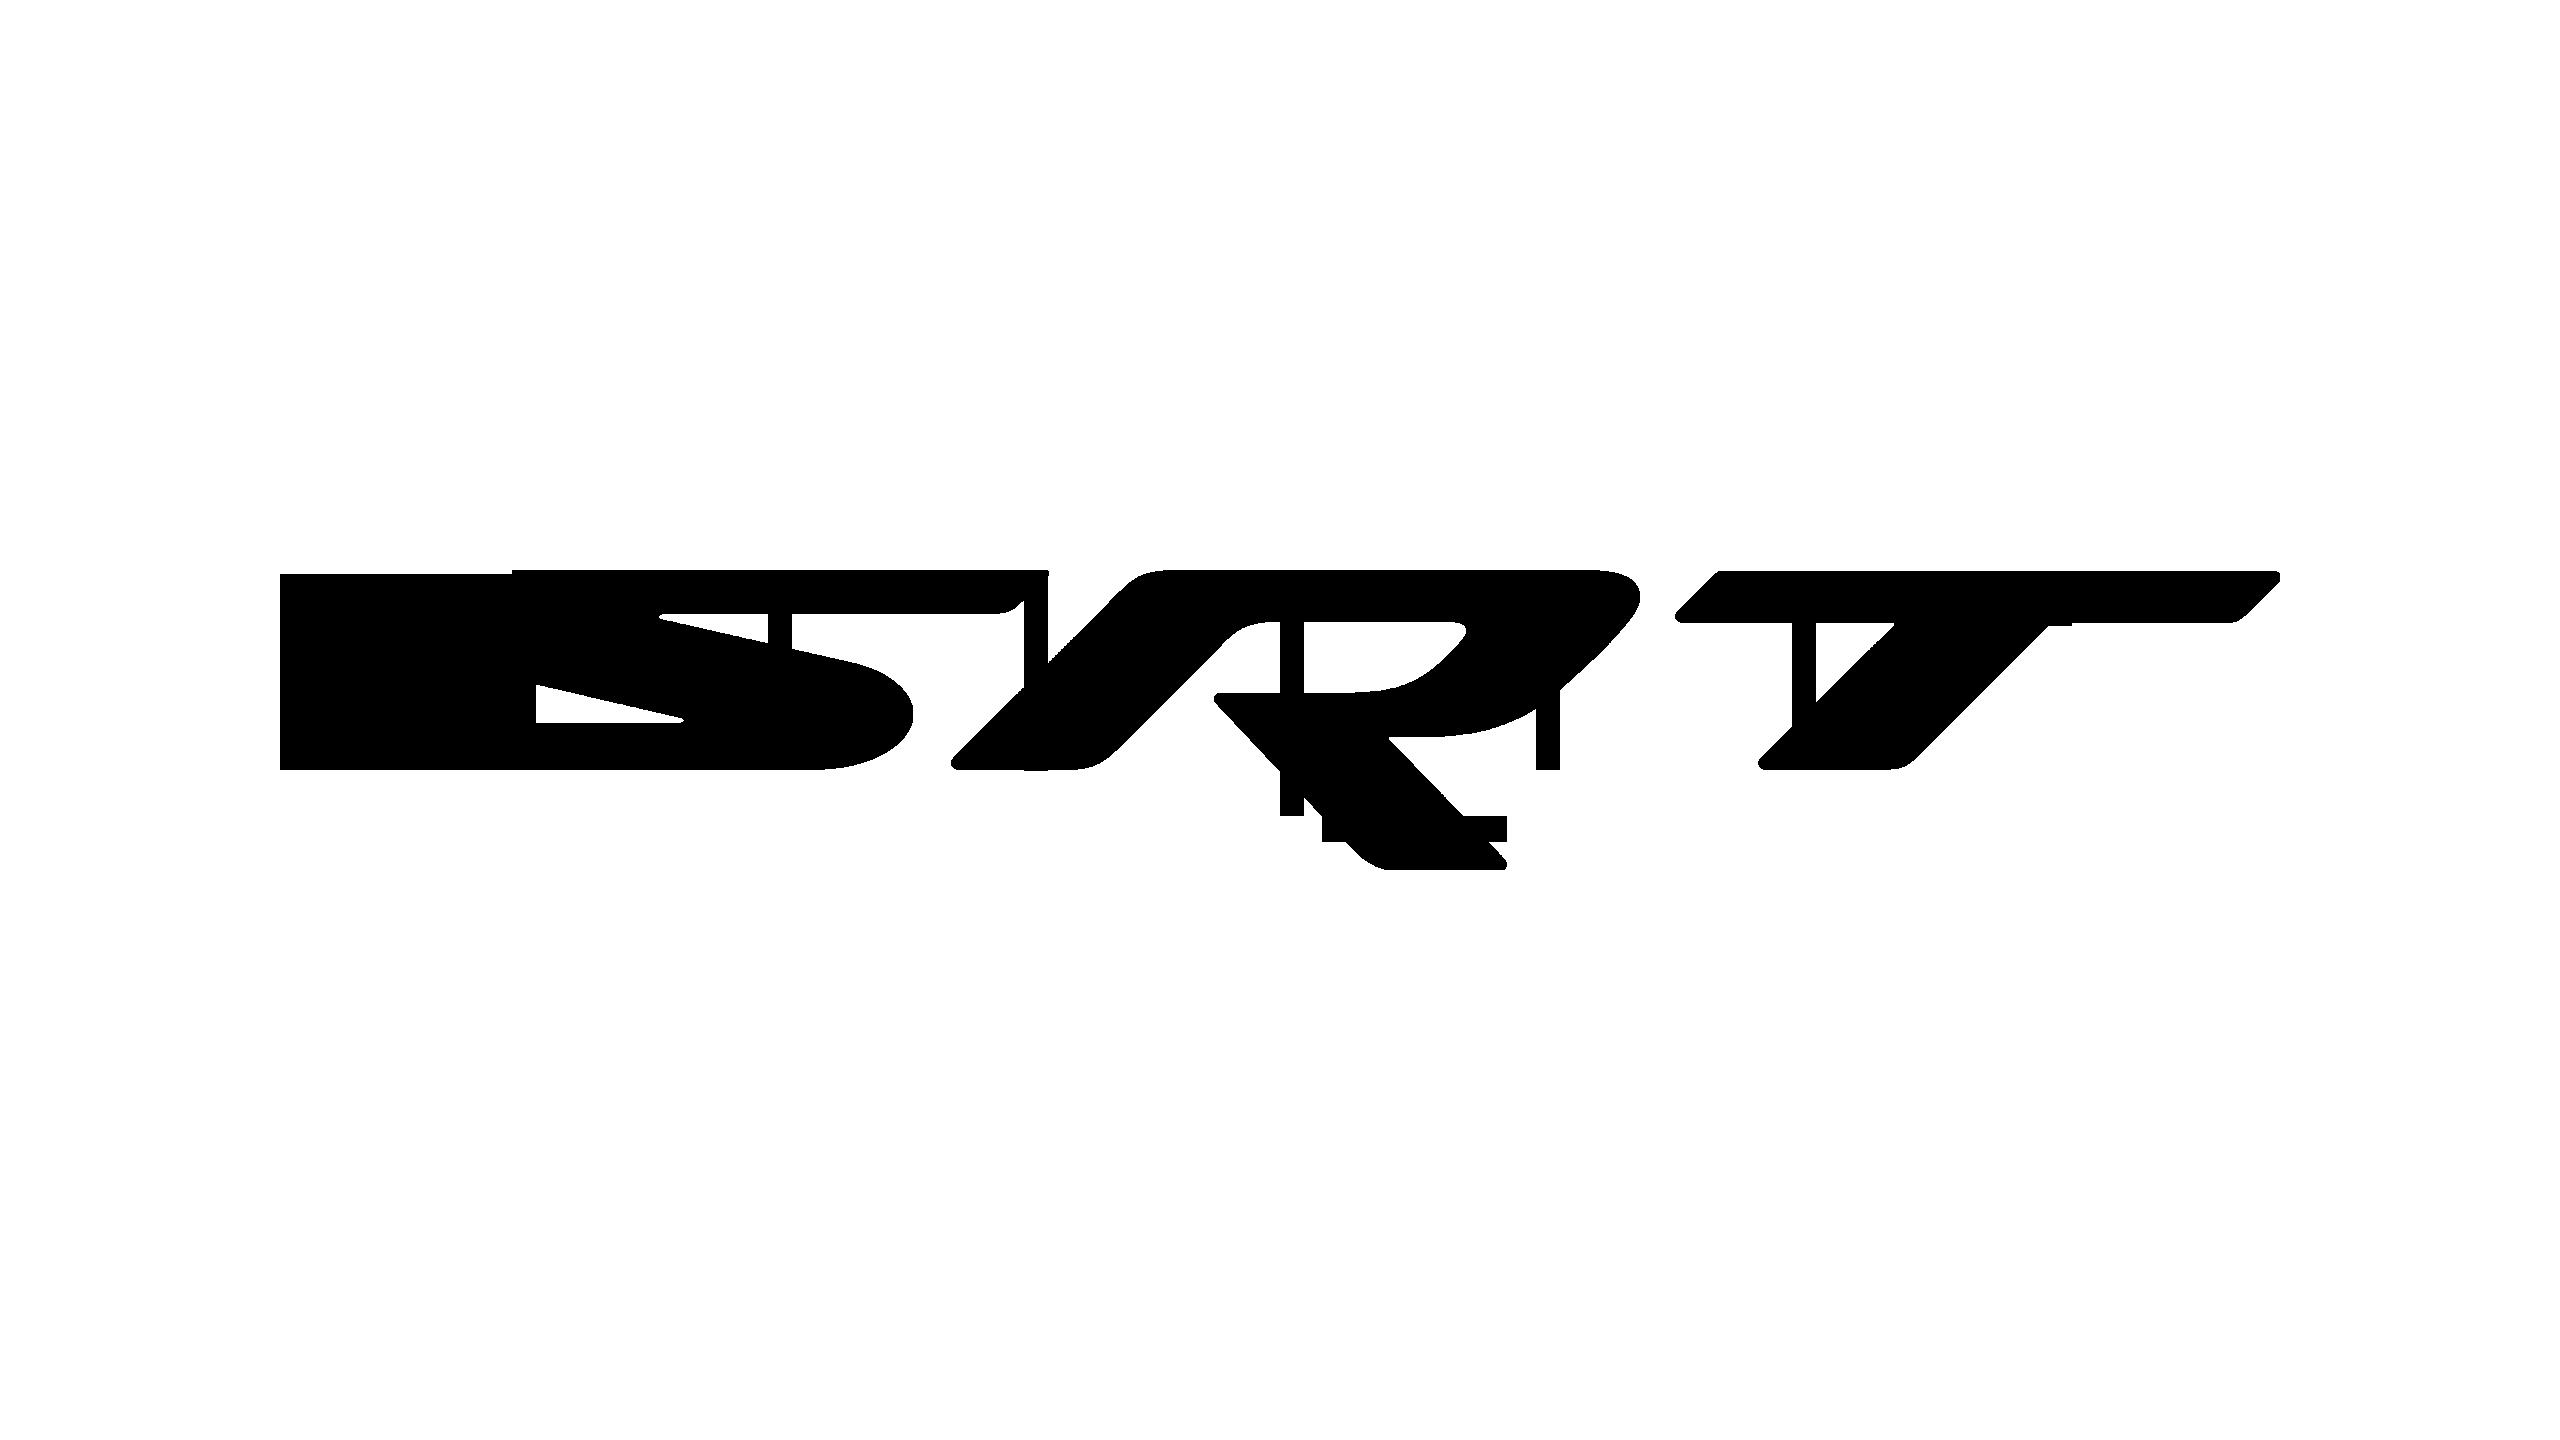 Dodge Viper Logo Hd Png Information